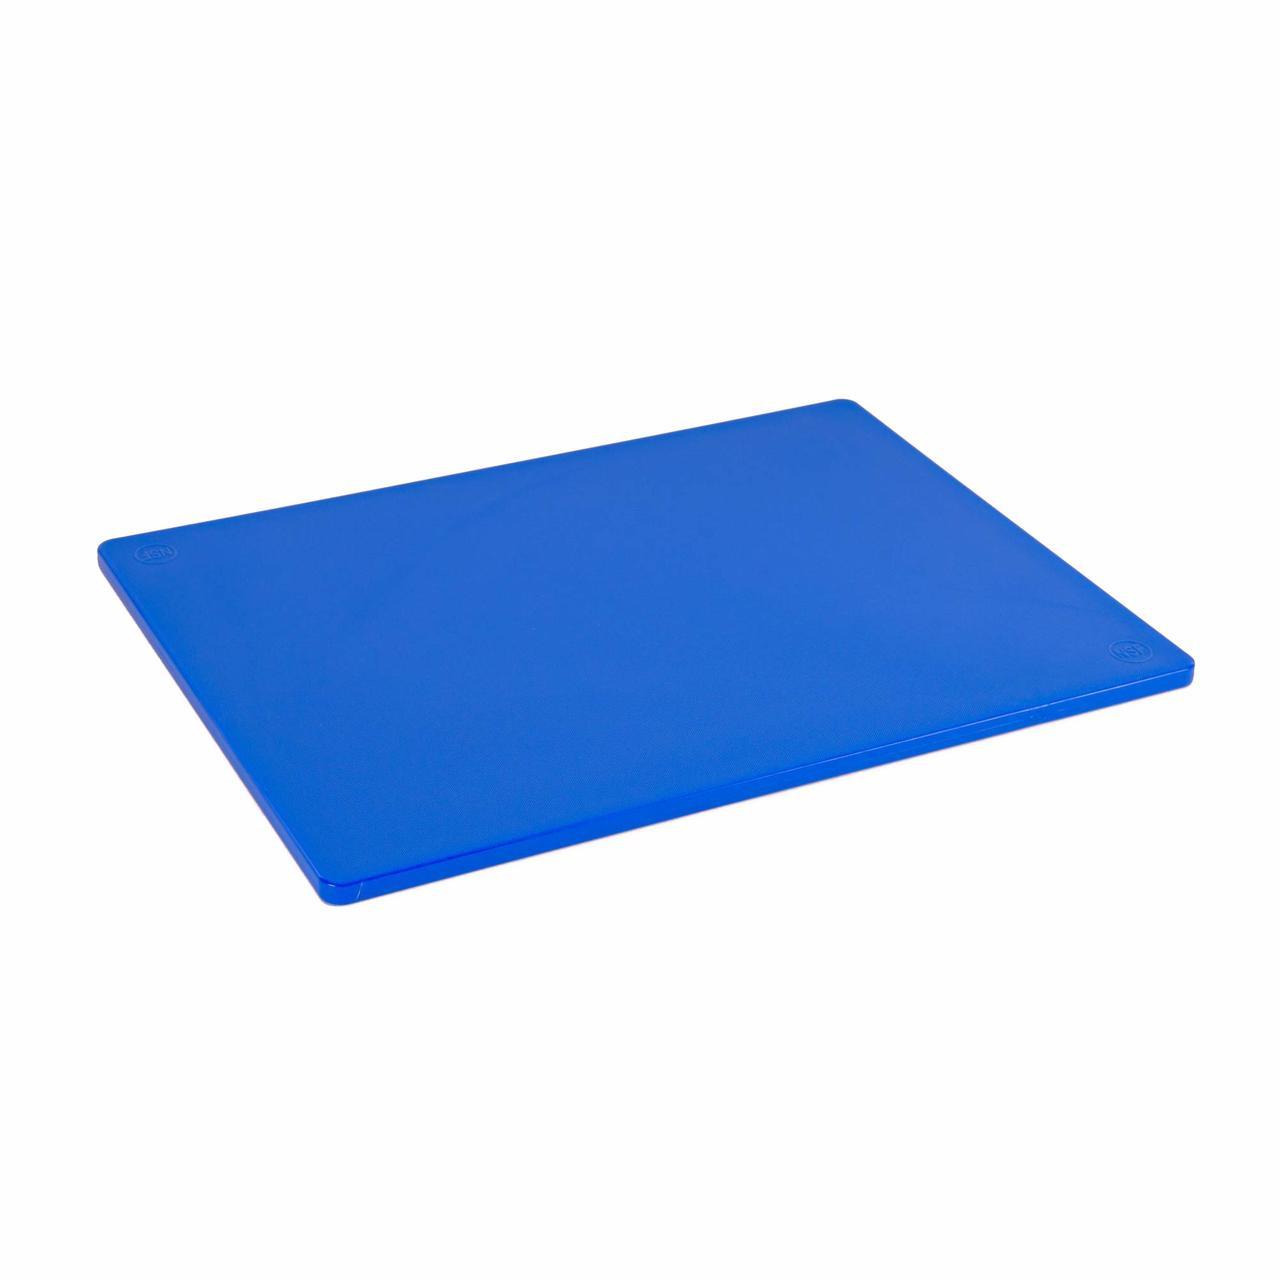 john boos kitchen islands cutting gloves for 12 x 18 basic blue poly board - ...